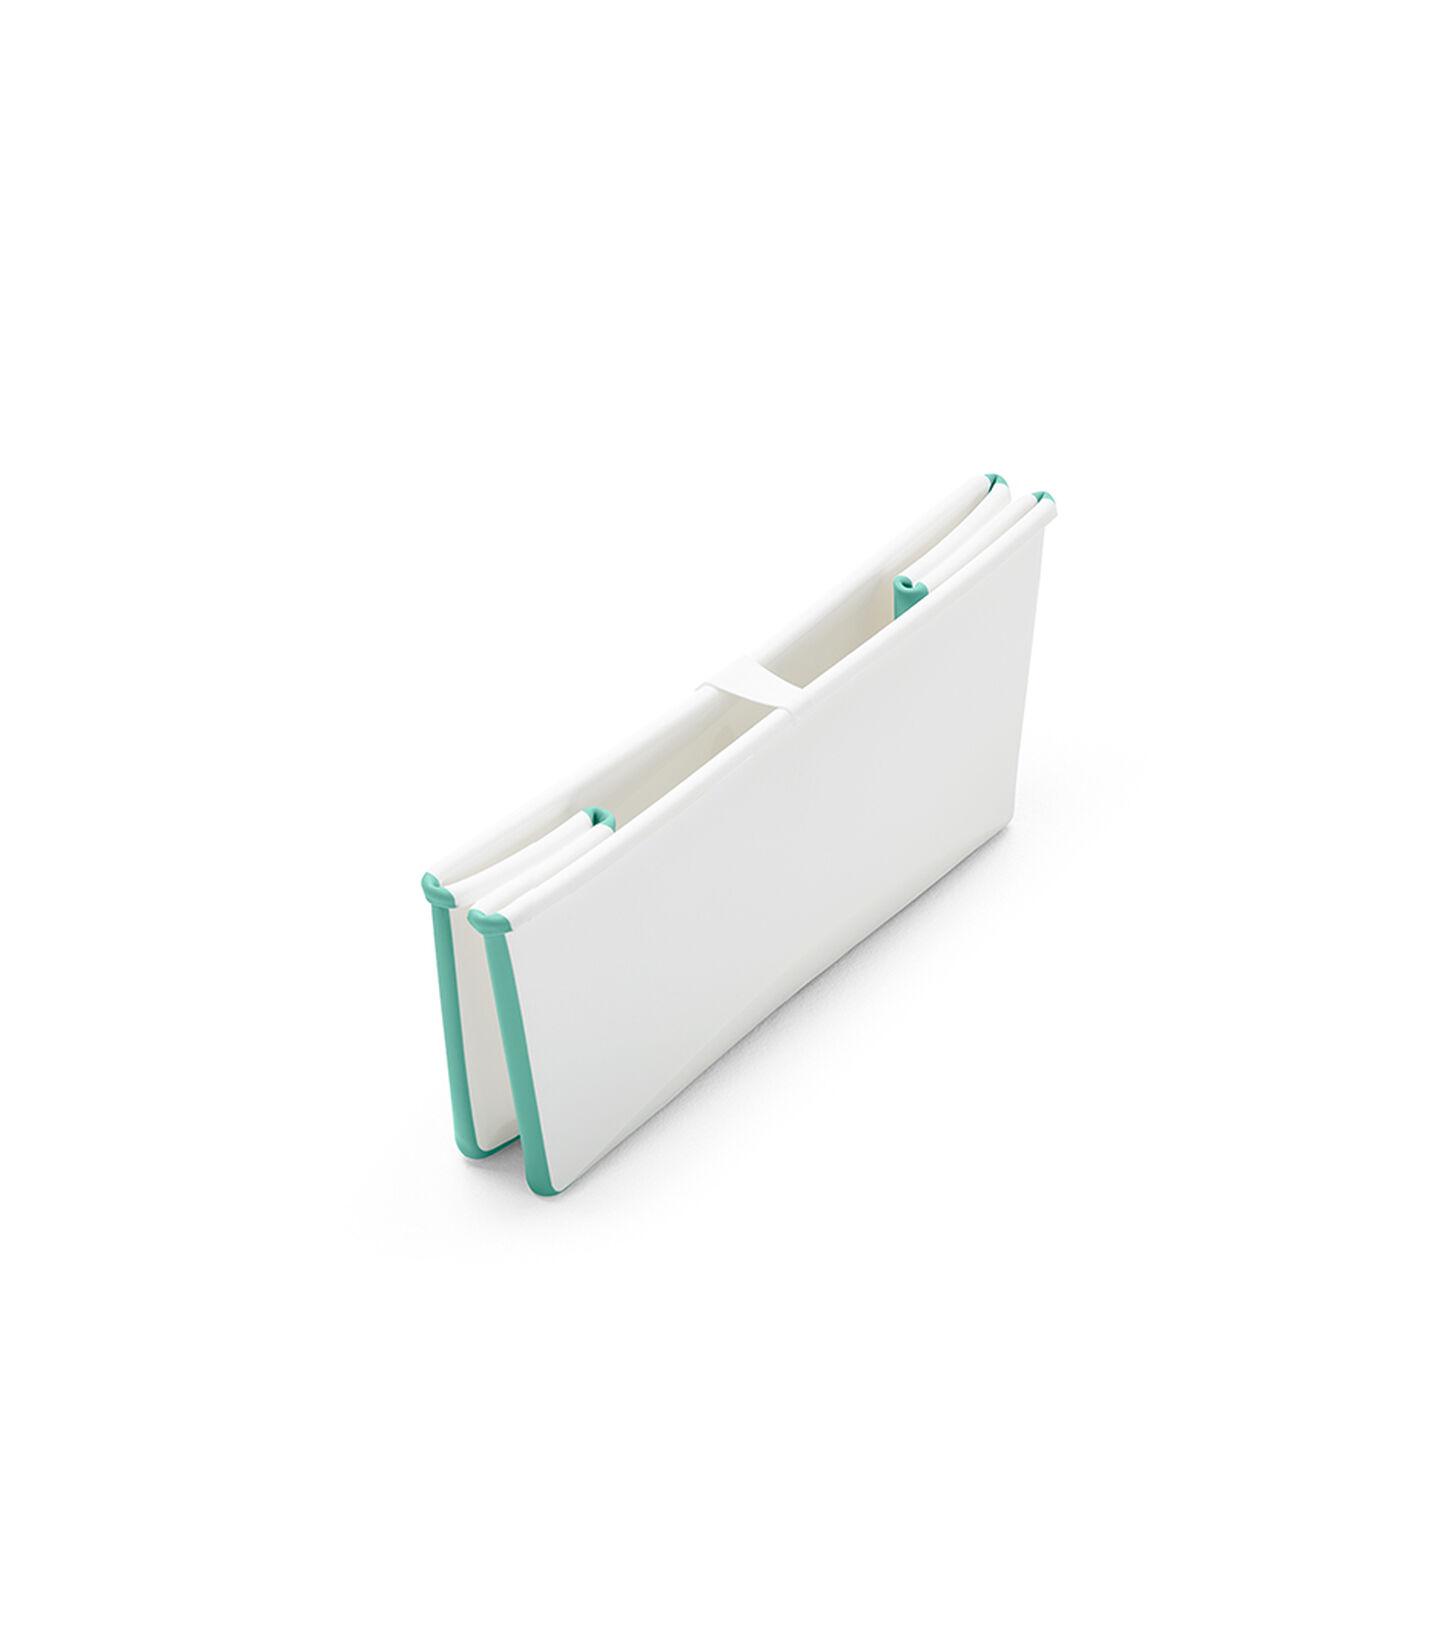 Stokke® Flexi Bath® Heat Bundle White Aqua, White Aqua, mainview view 3